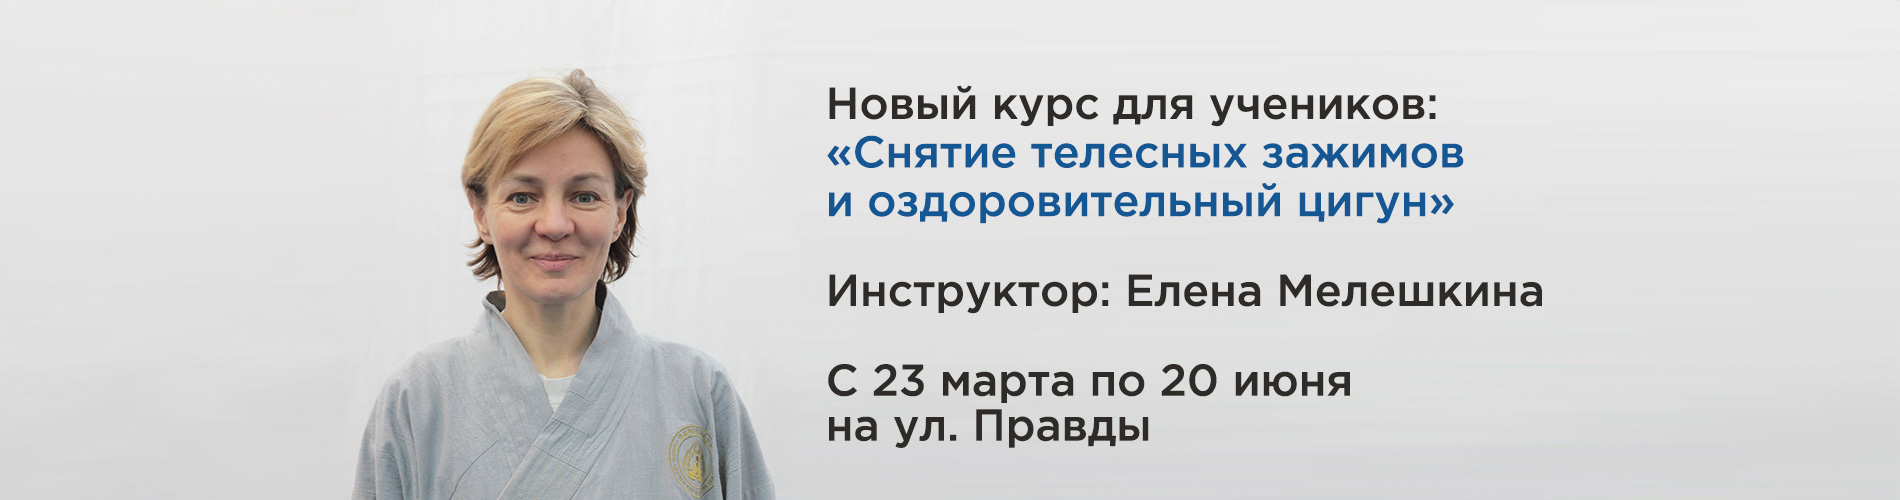 мелешкина_slider